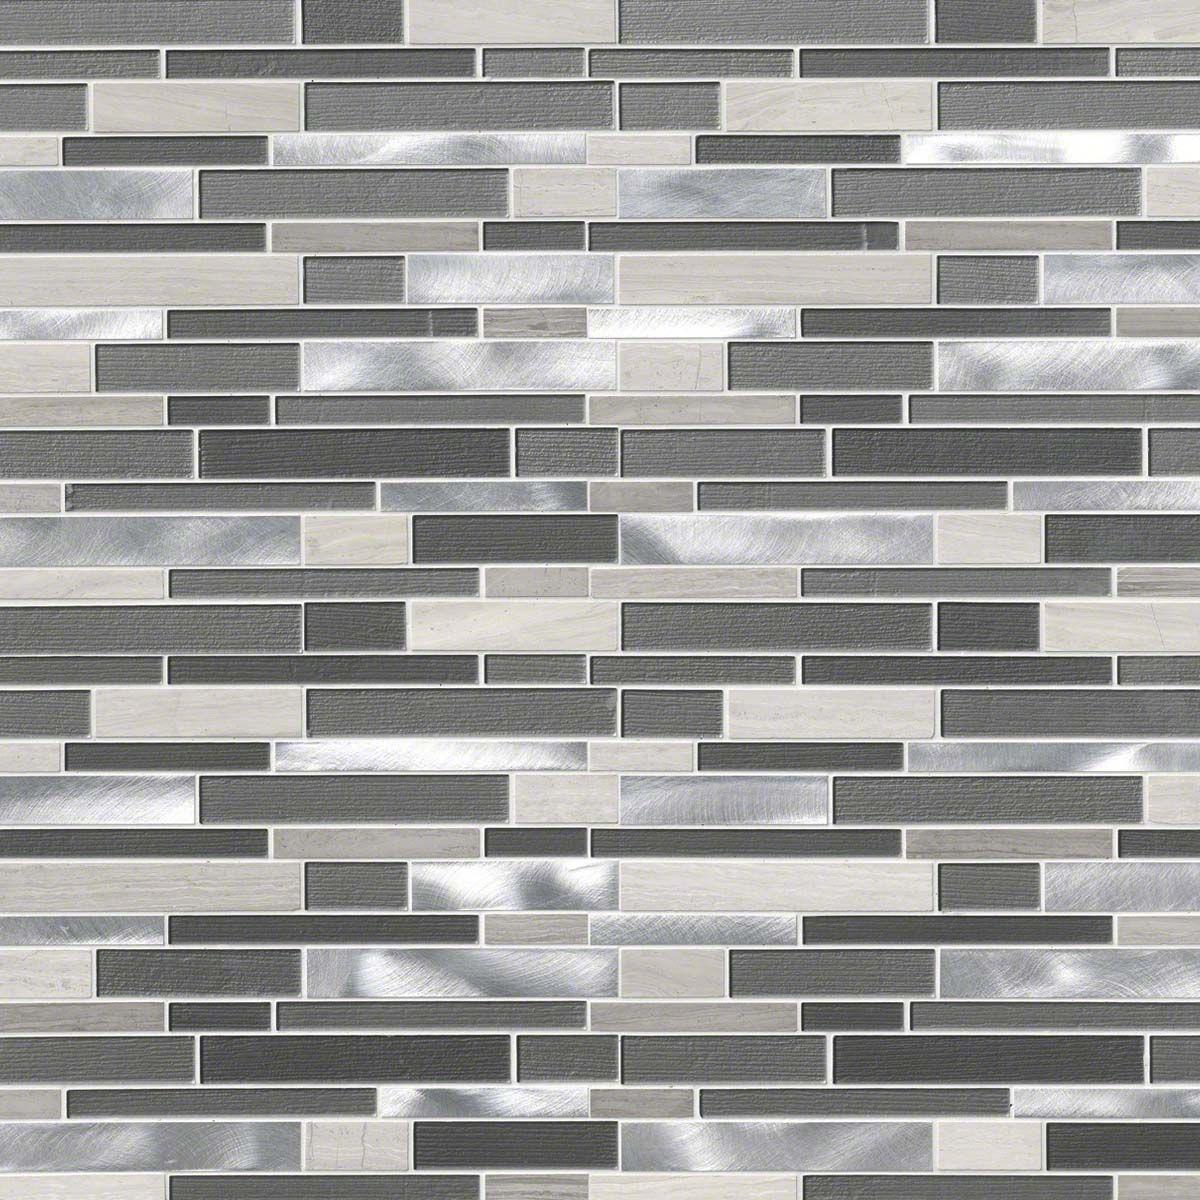 Urban Loft Interlocking Pattern 4mm Metal Mosaic Tiles Gray Kitchen Backsplash Minimalist Kitchen Design